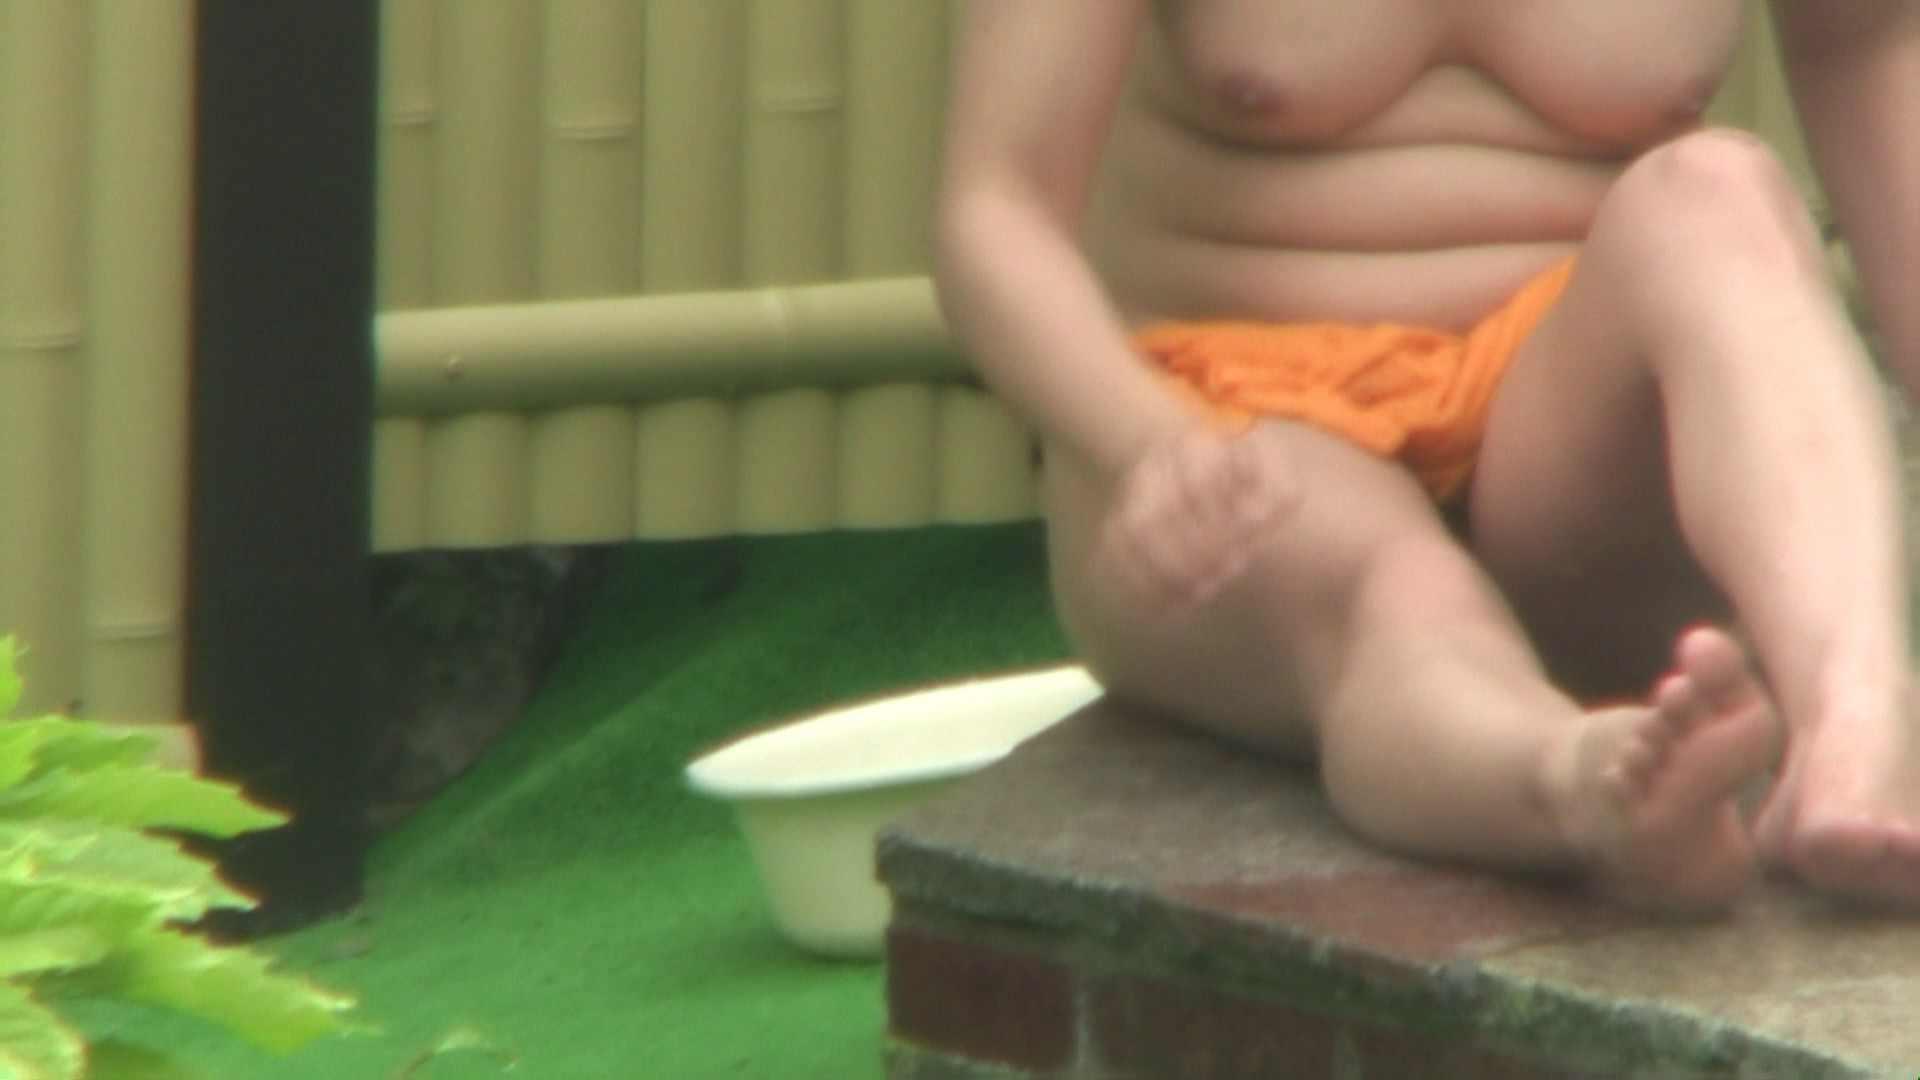 Aquaな露天風呂Vol.74【VIP限定】 盗撮 隠し撮りオマンコ動画紹介 68画像 32